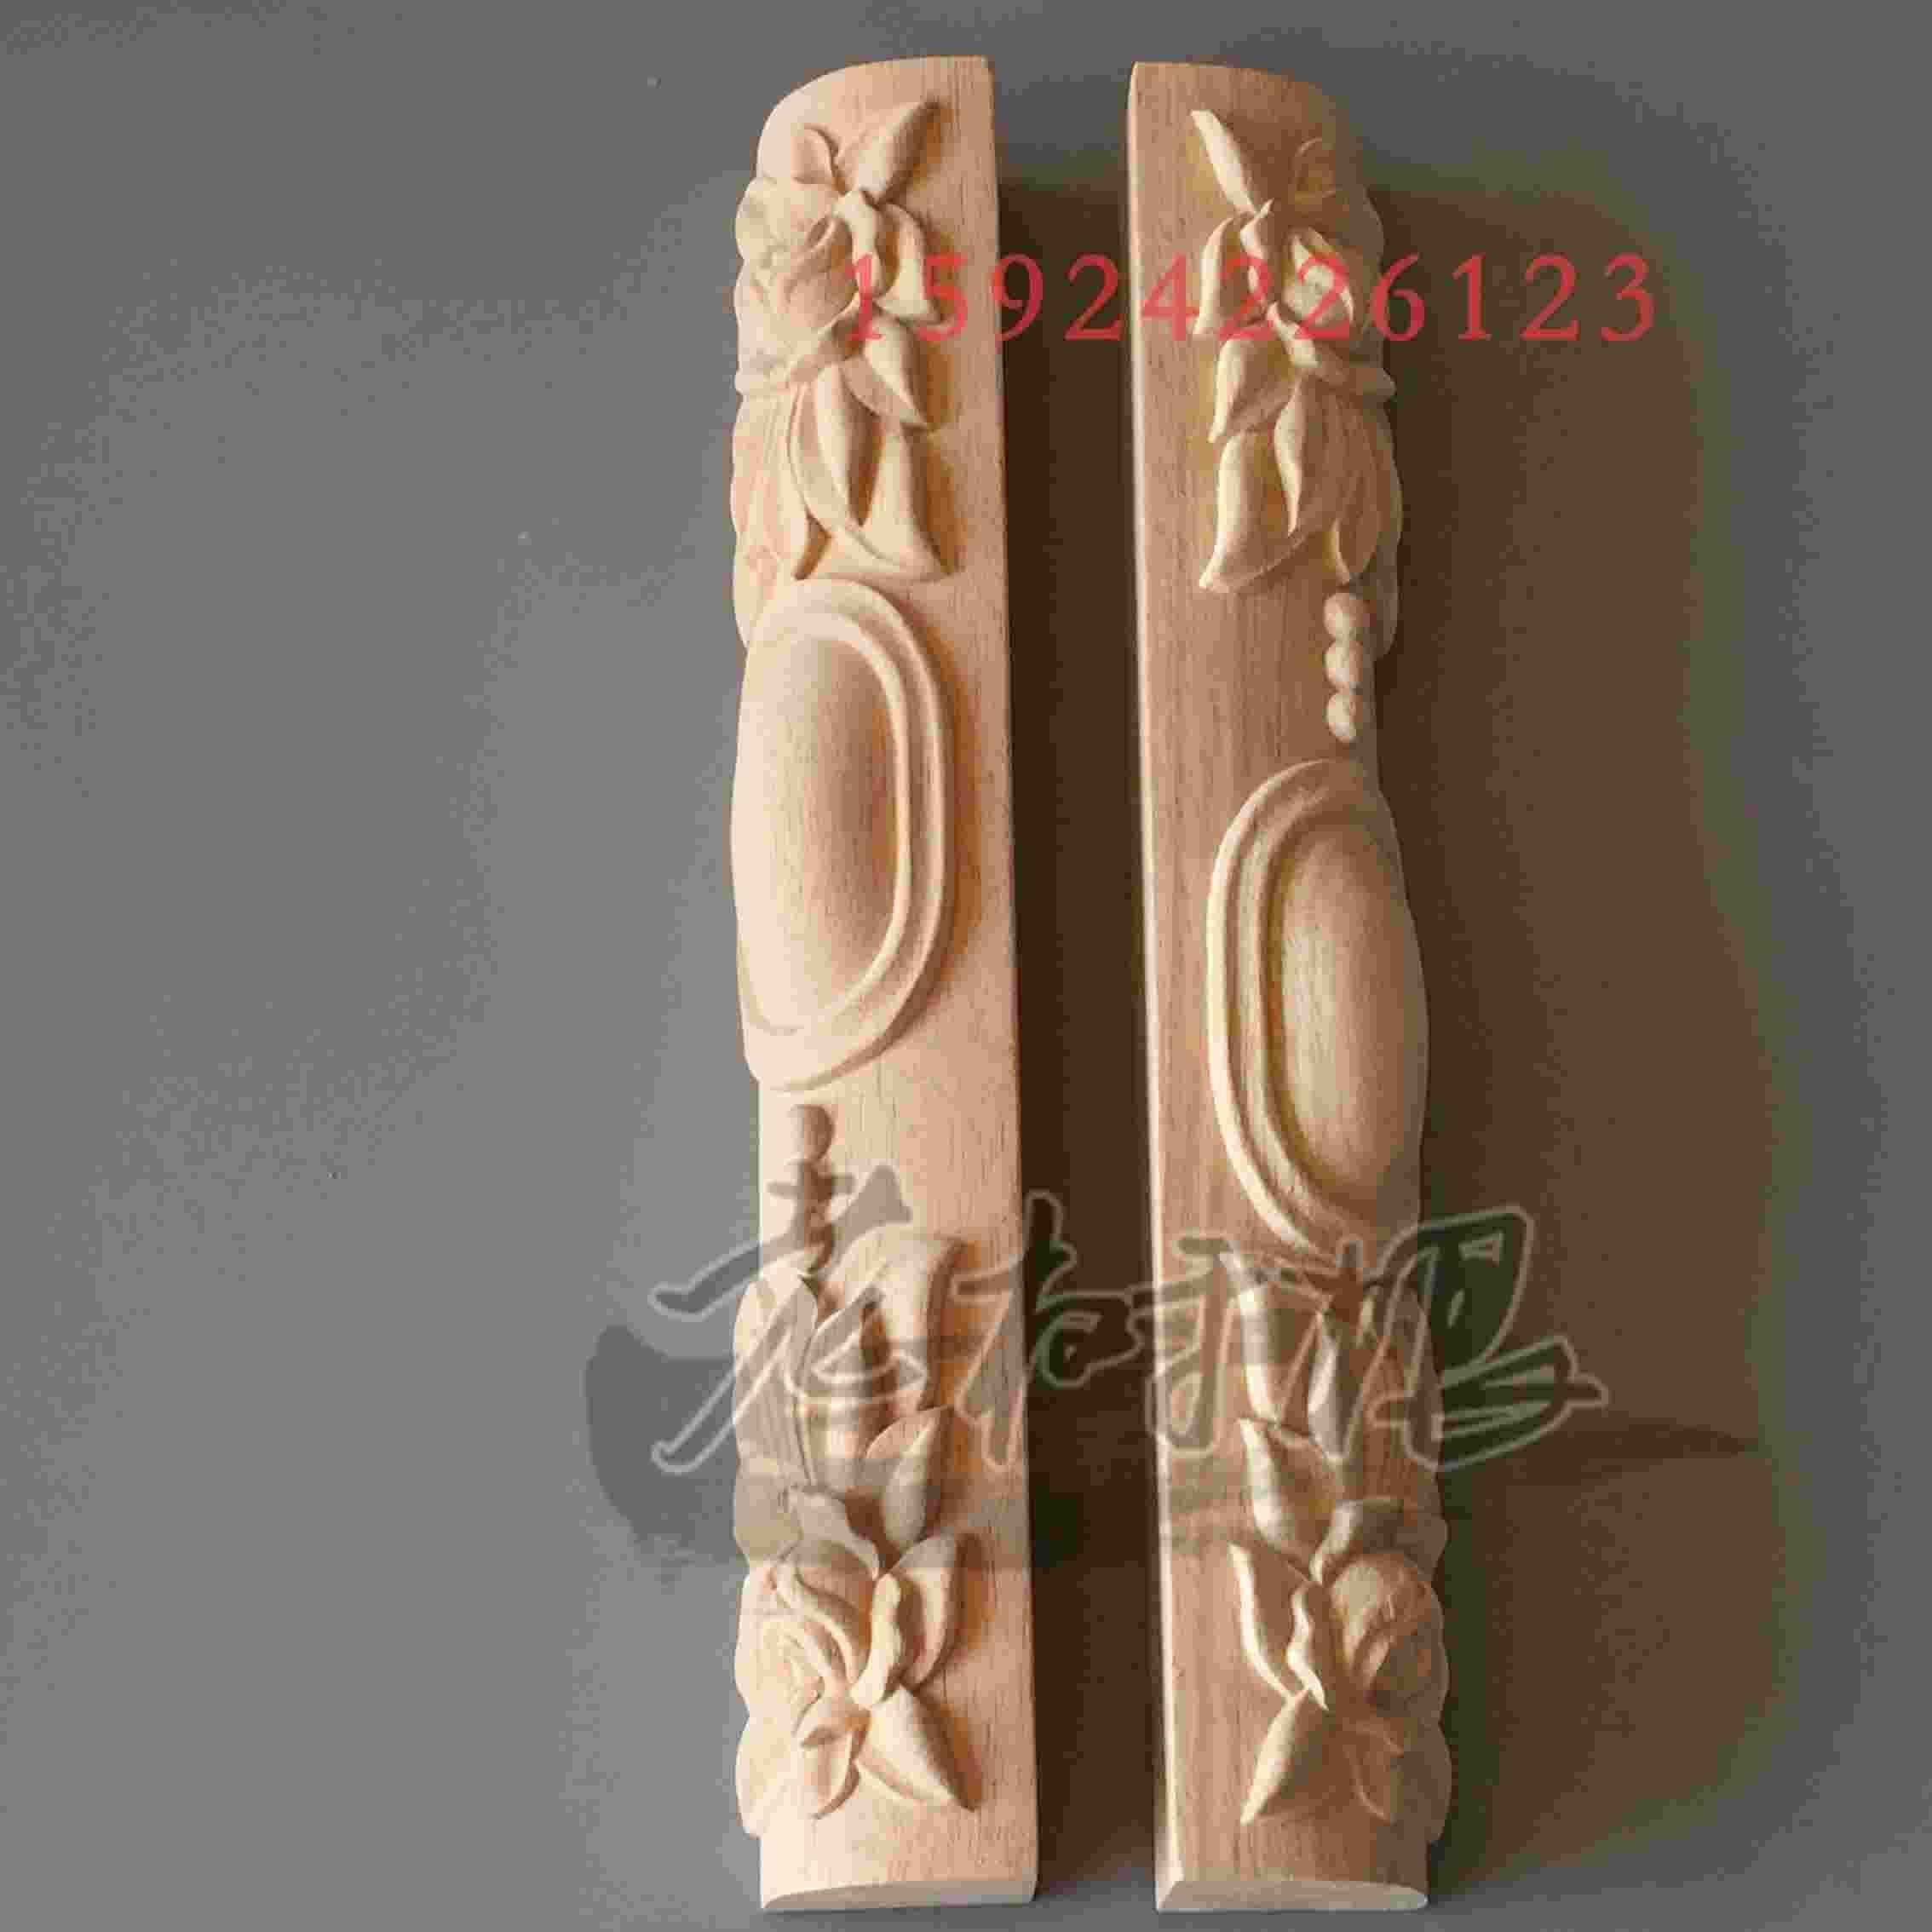 Compre Dongyang Madera Tallada Pilares De Madera Tallada Pilares  # Muebles Tallados En Madera